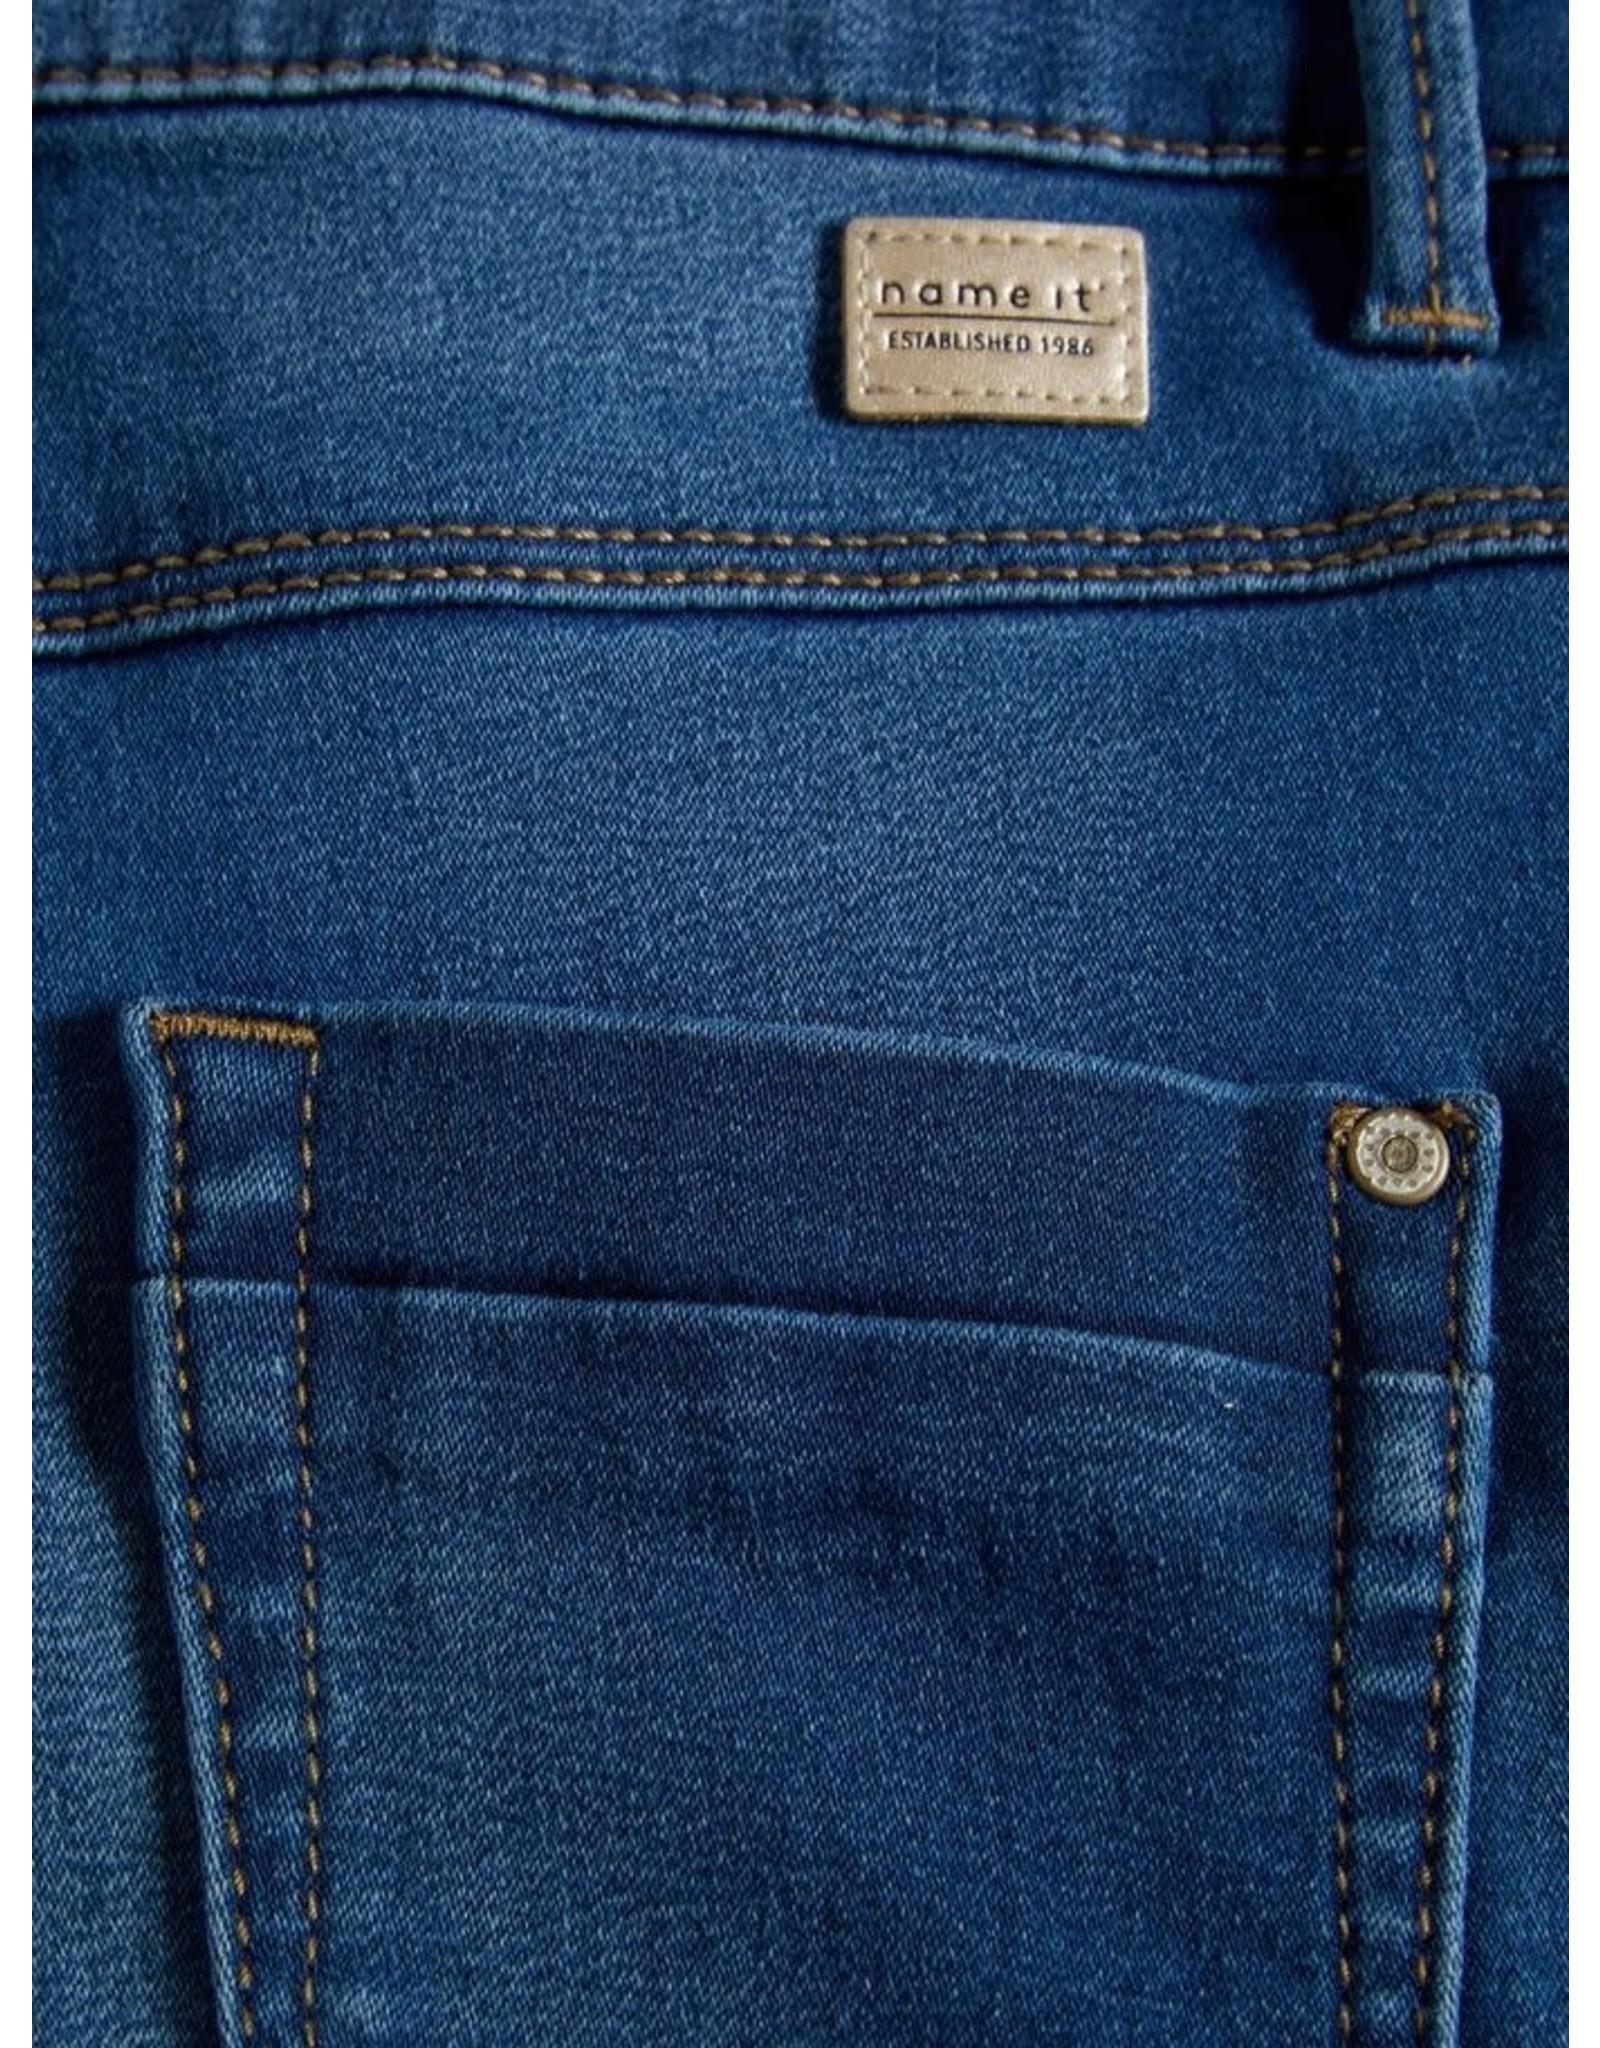 Name It Name It Super Zachte Meisjes Jeans